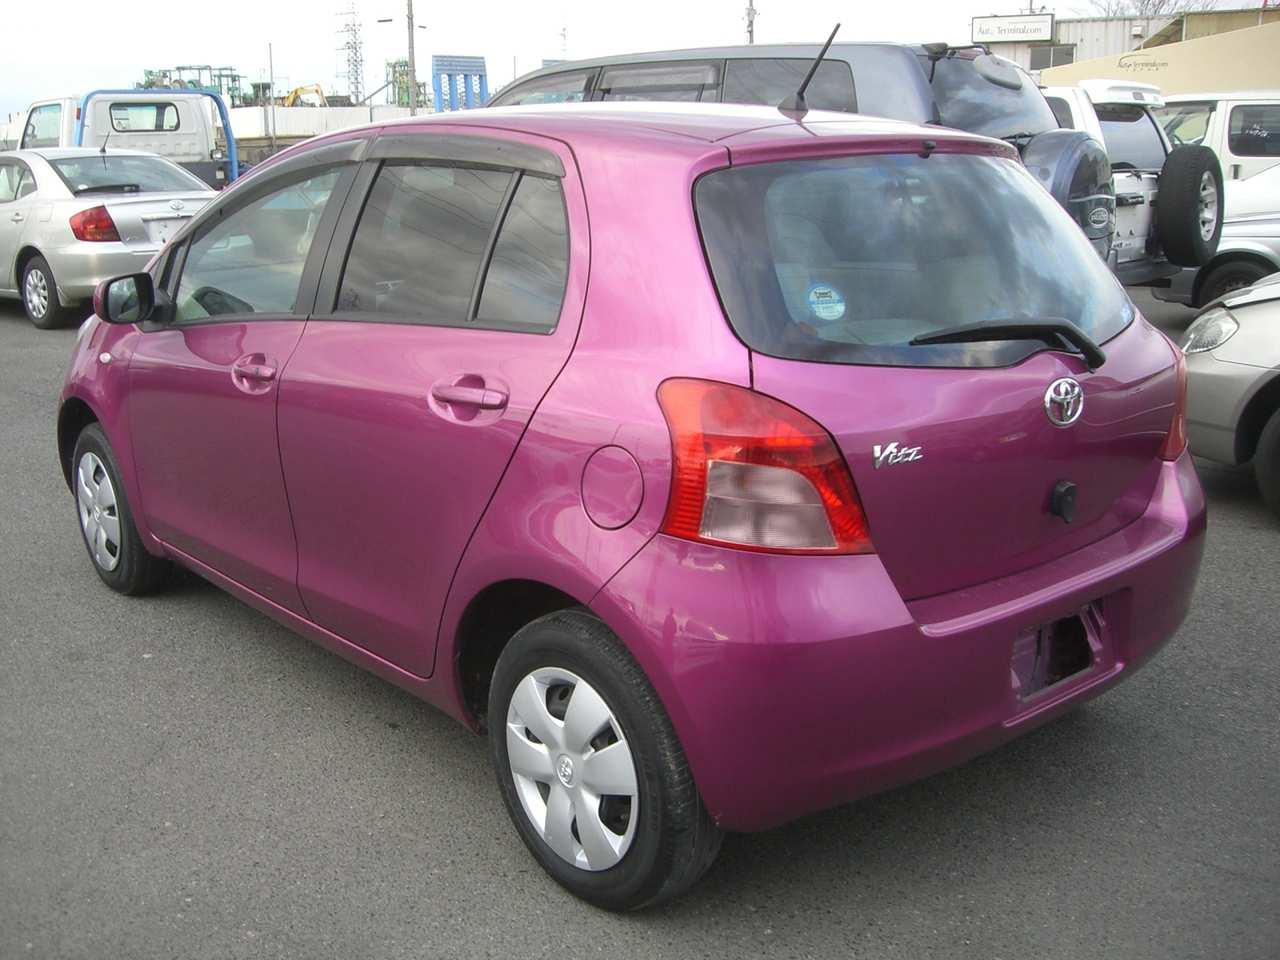 Toyota Vitz Car Models